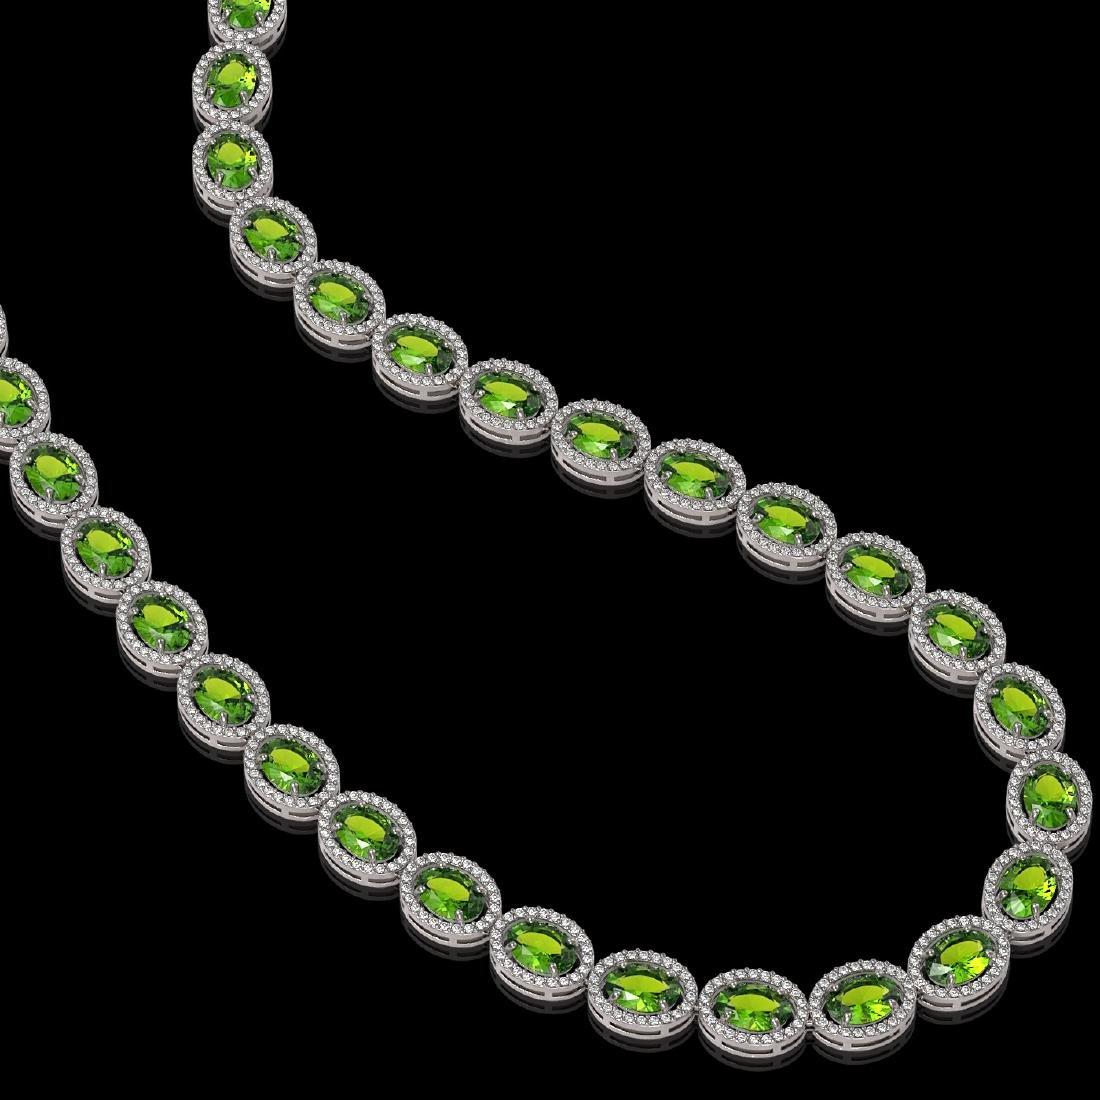 48.14 CTW Peridot & Diamond Halo Necklace 10K White